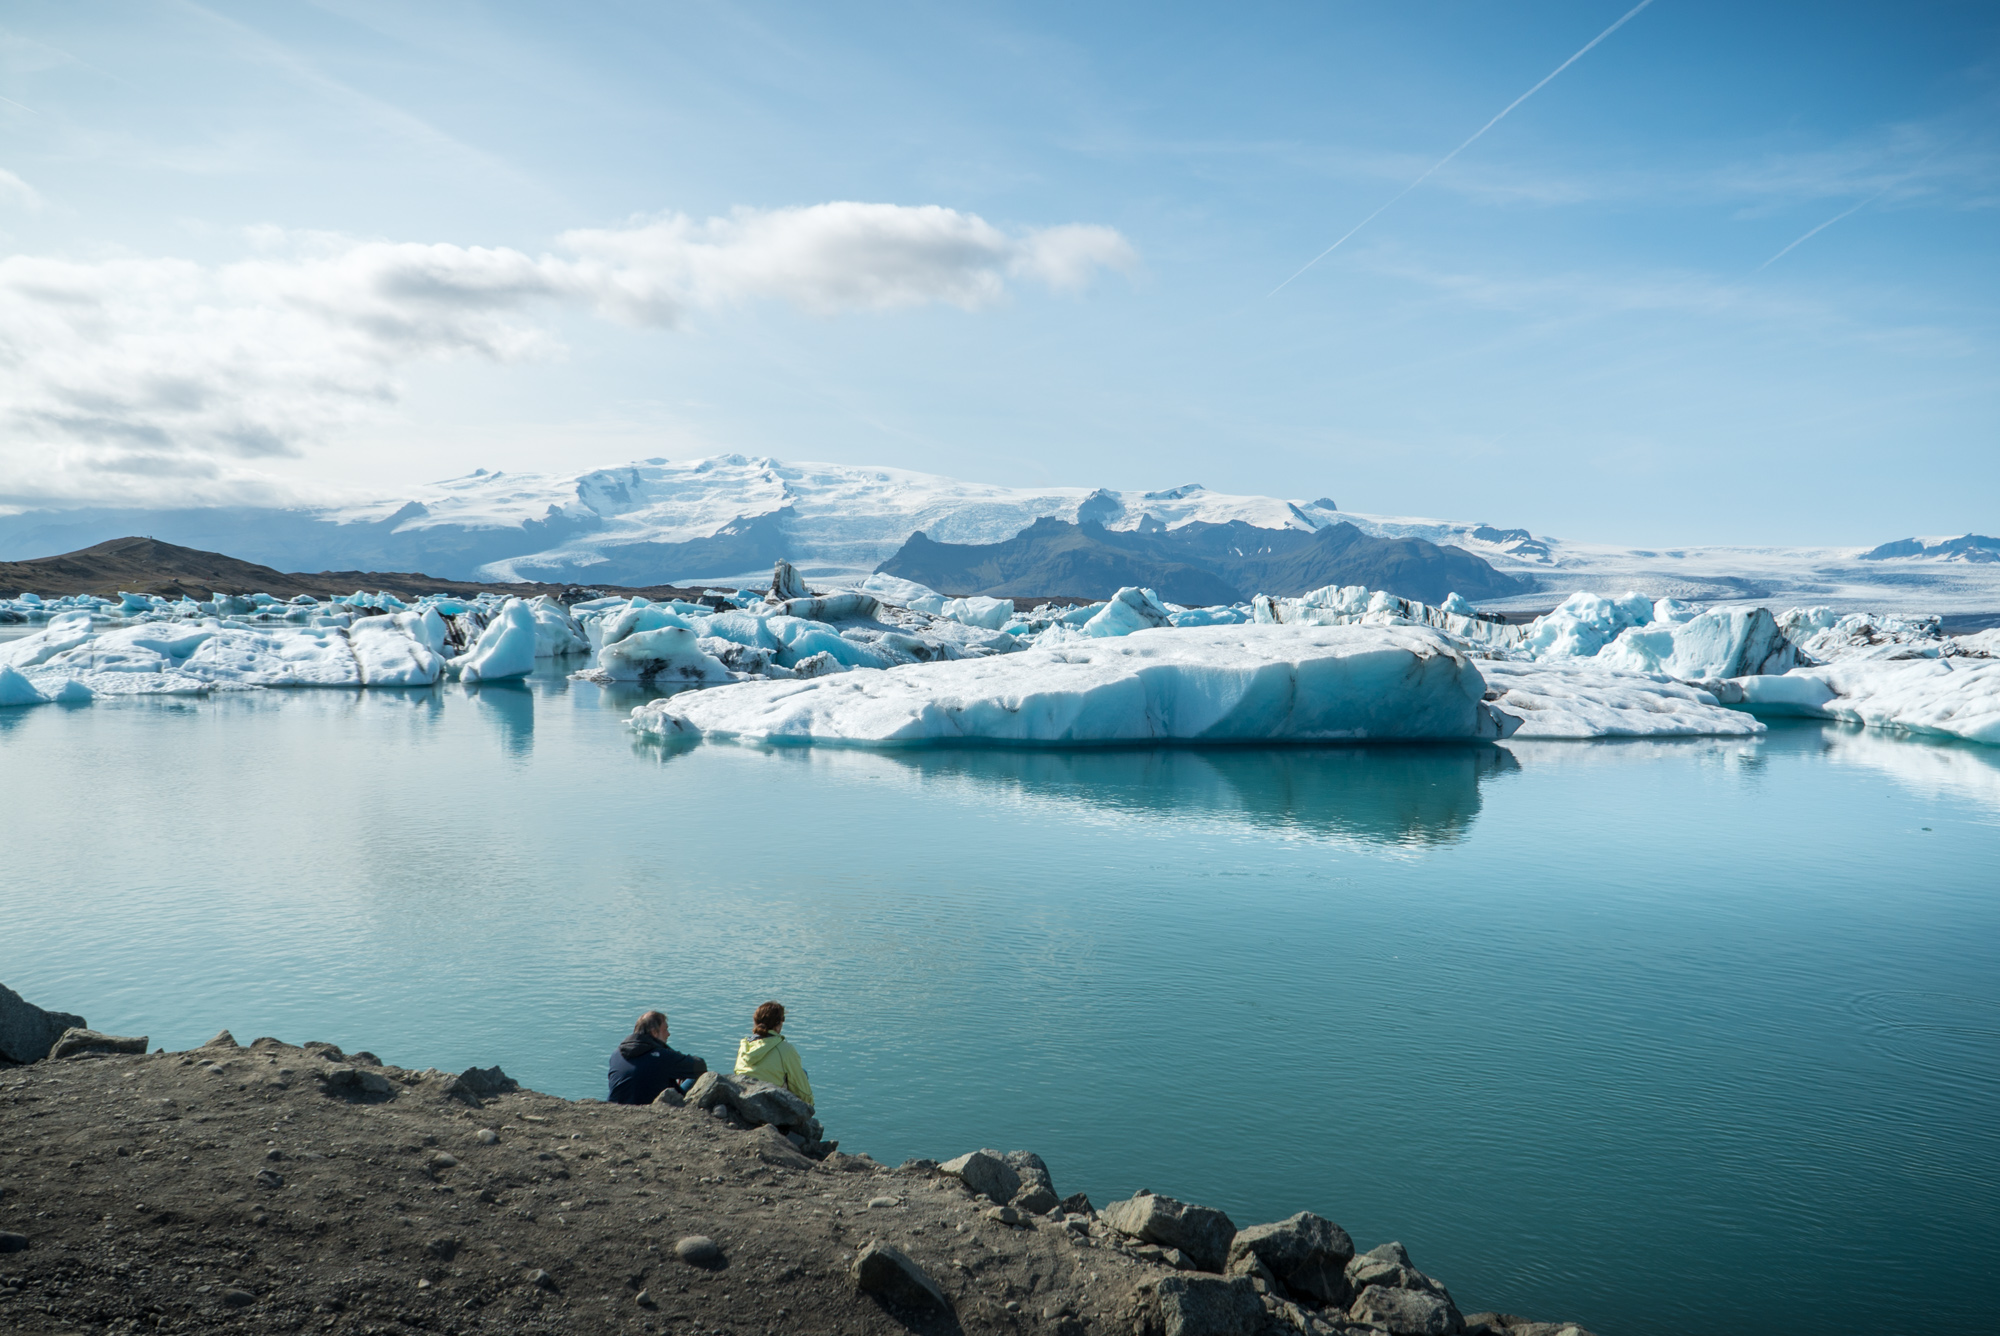 Jokulsarlon Ice Glacier Lagoon